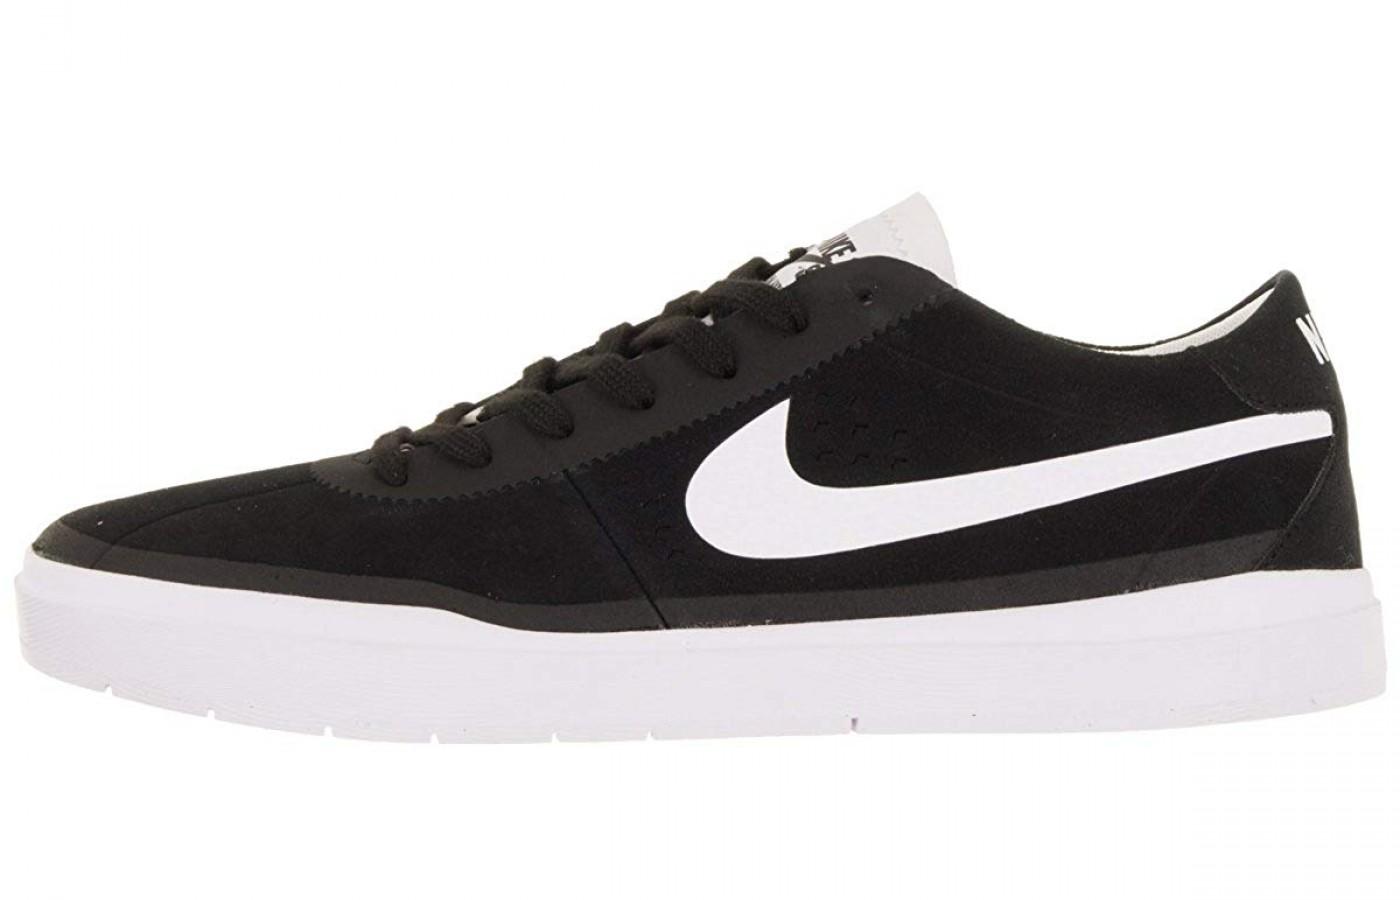 Nike Bruin Hyperfeel Left Angle